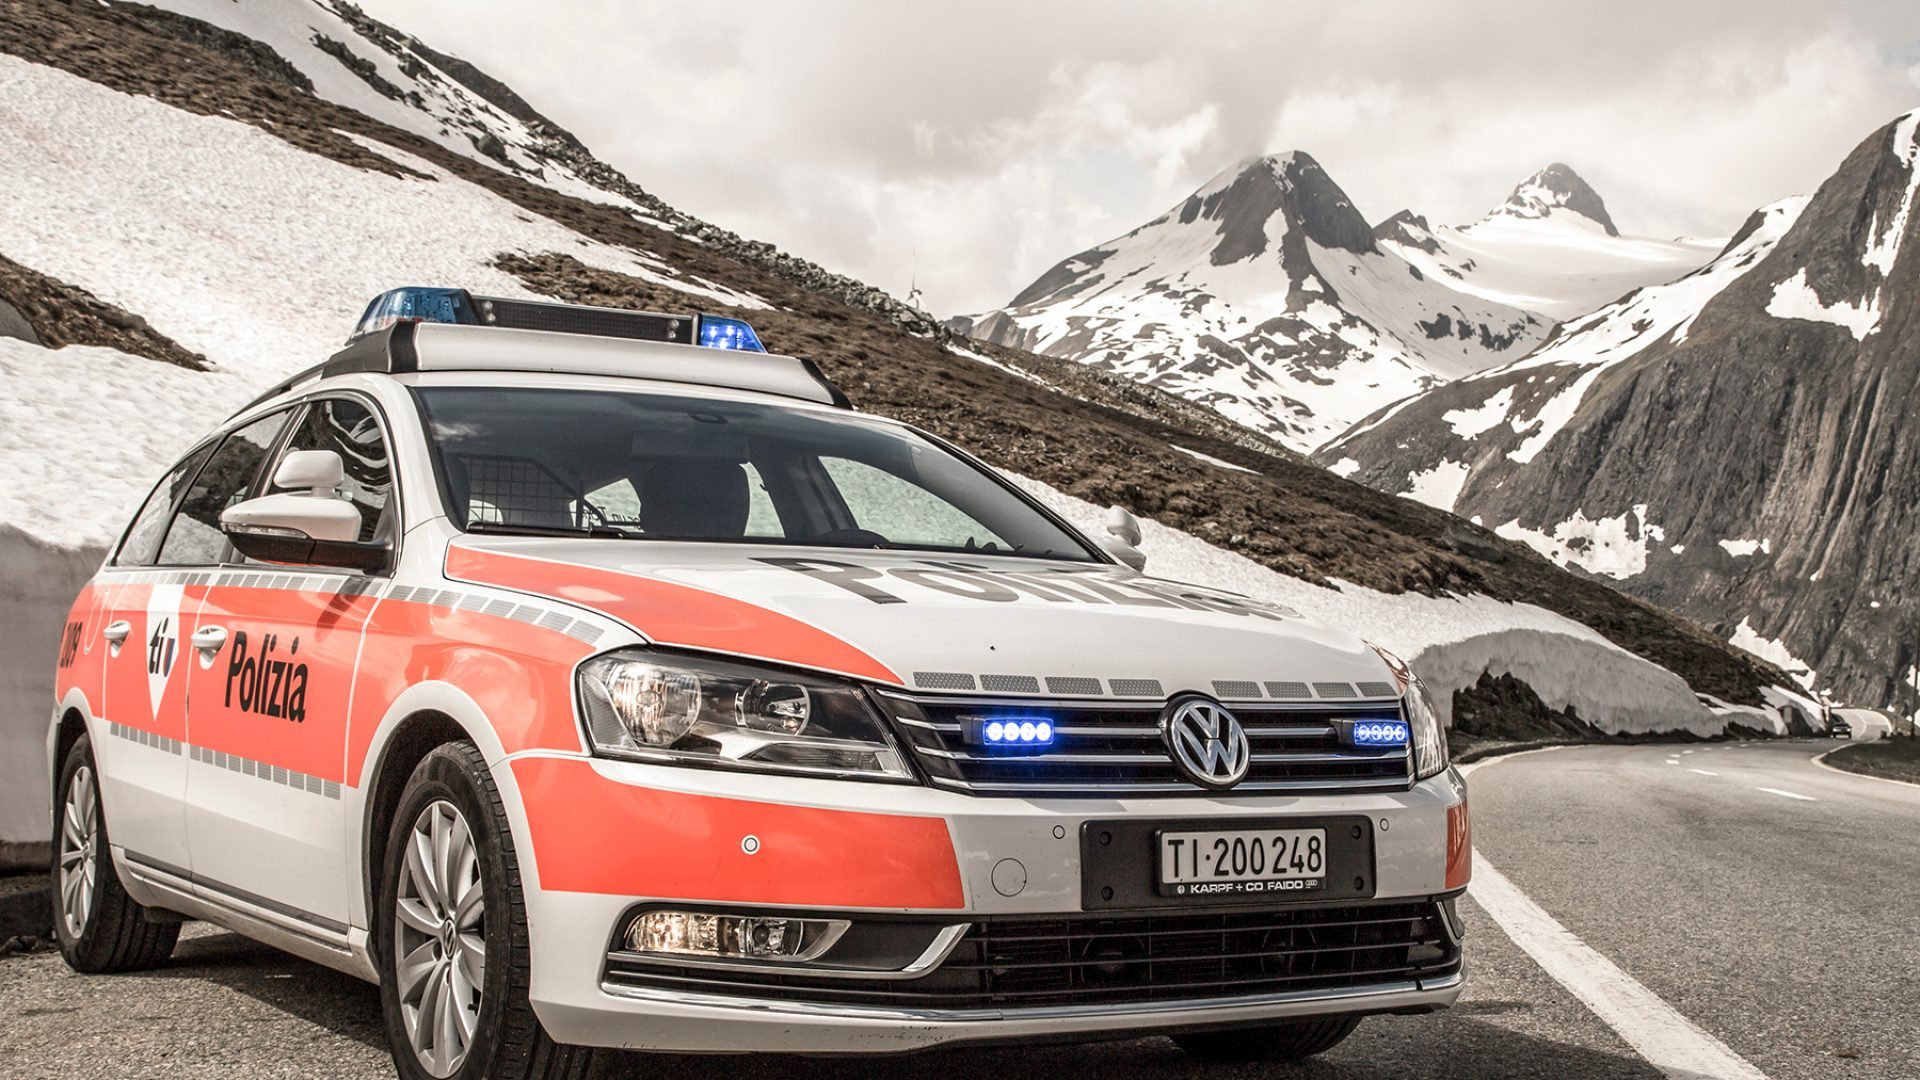 Switzerland crime rate